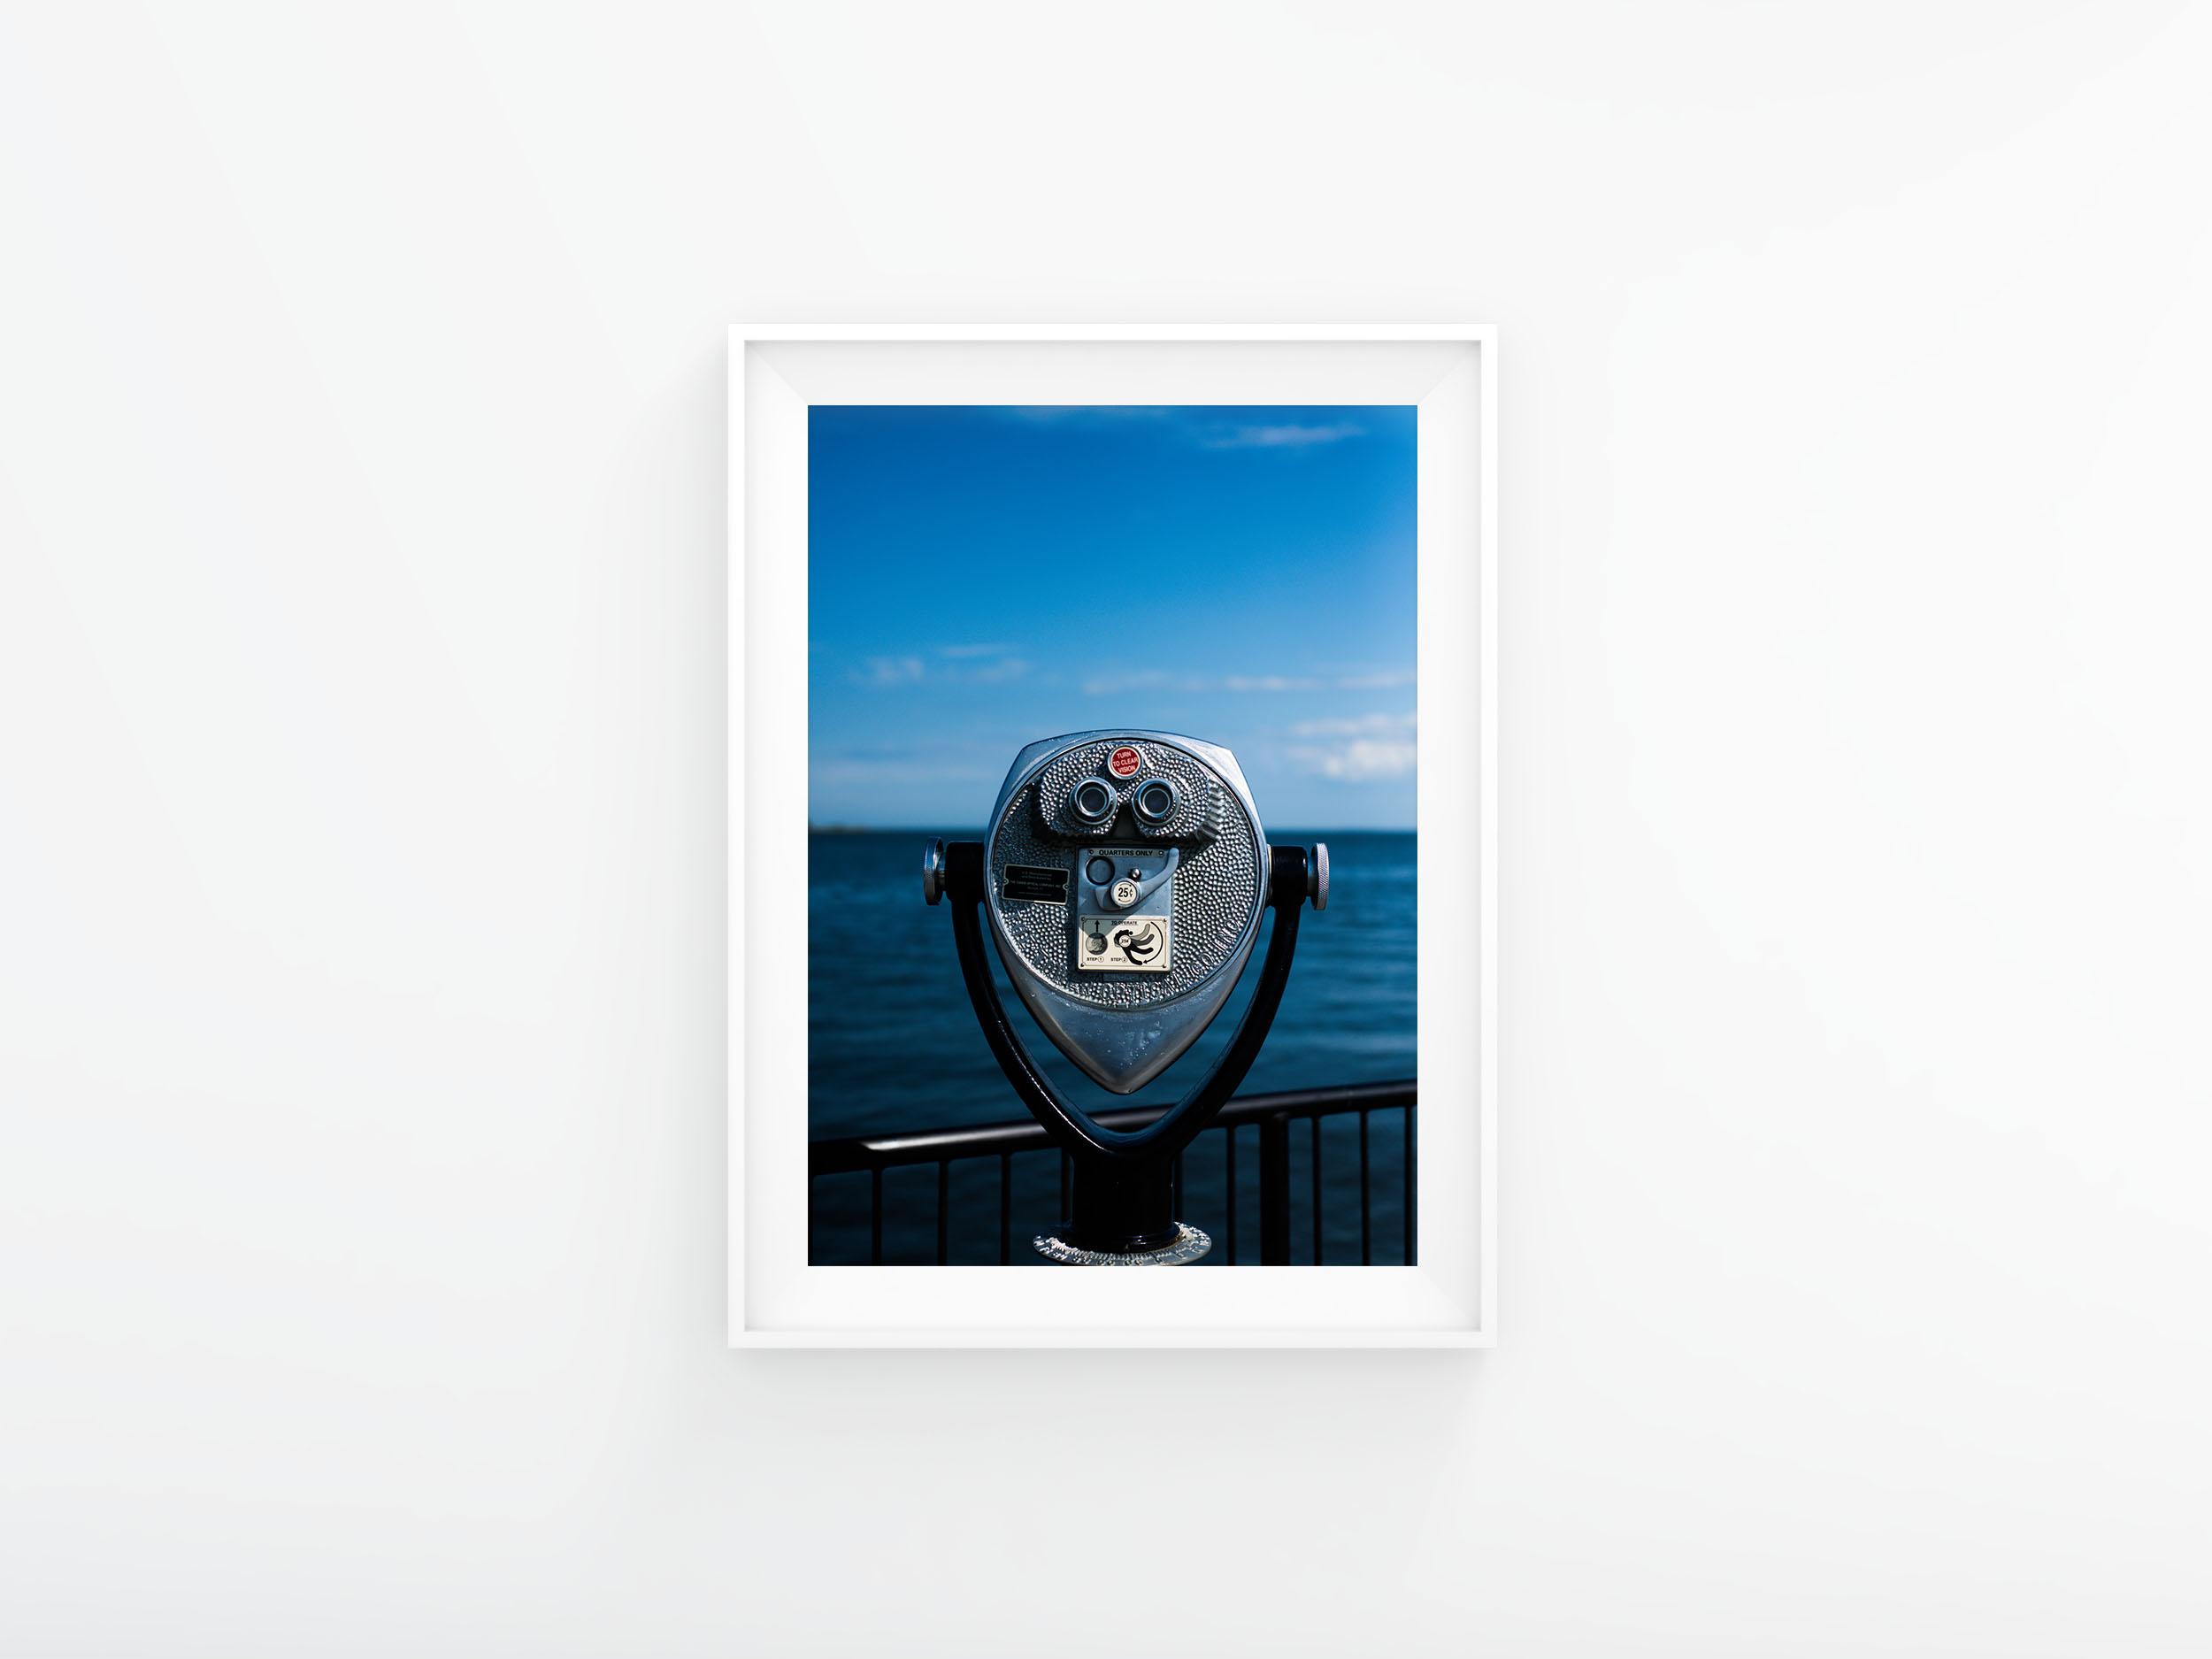 mbp_framed image_3.jpg